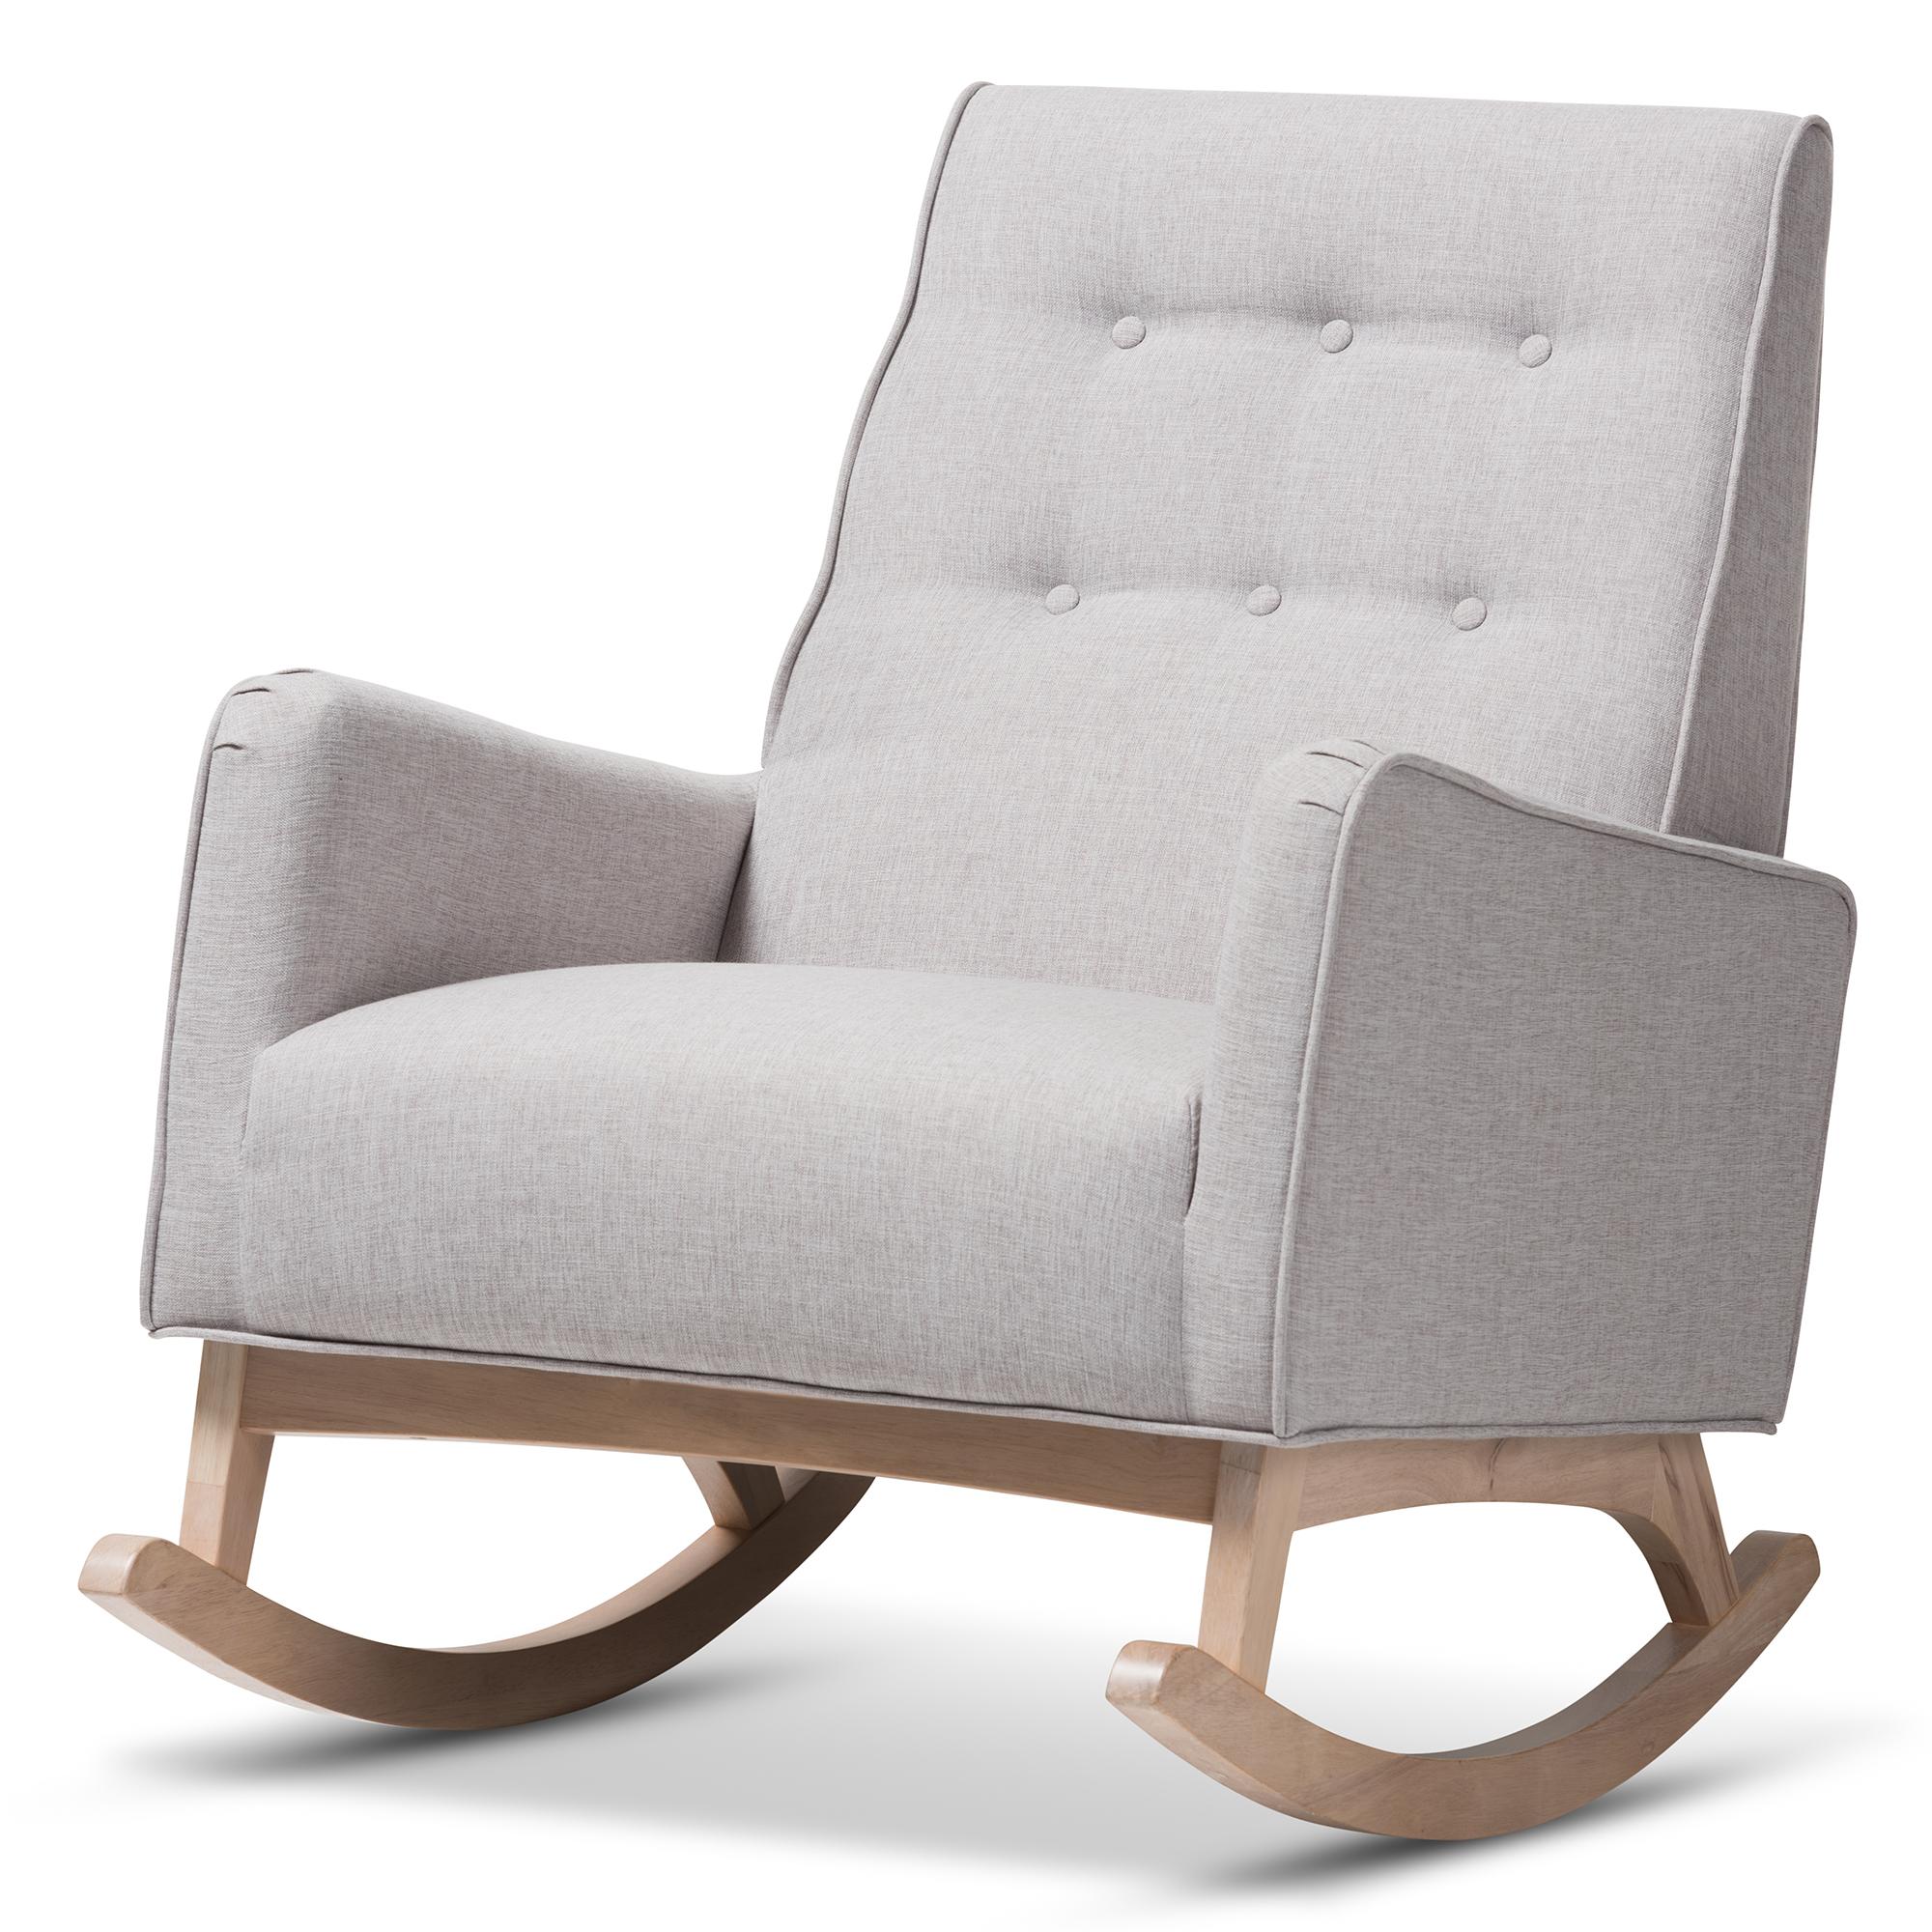 Baxton Studio Marlena Mid Century Modern Greyish Beige Fabric Upholstered  Whitewash Wood Rocking Chair